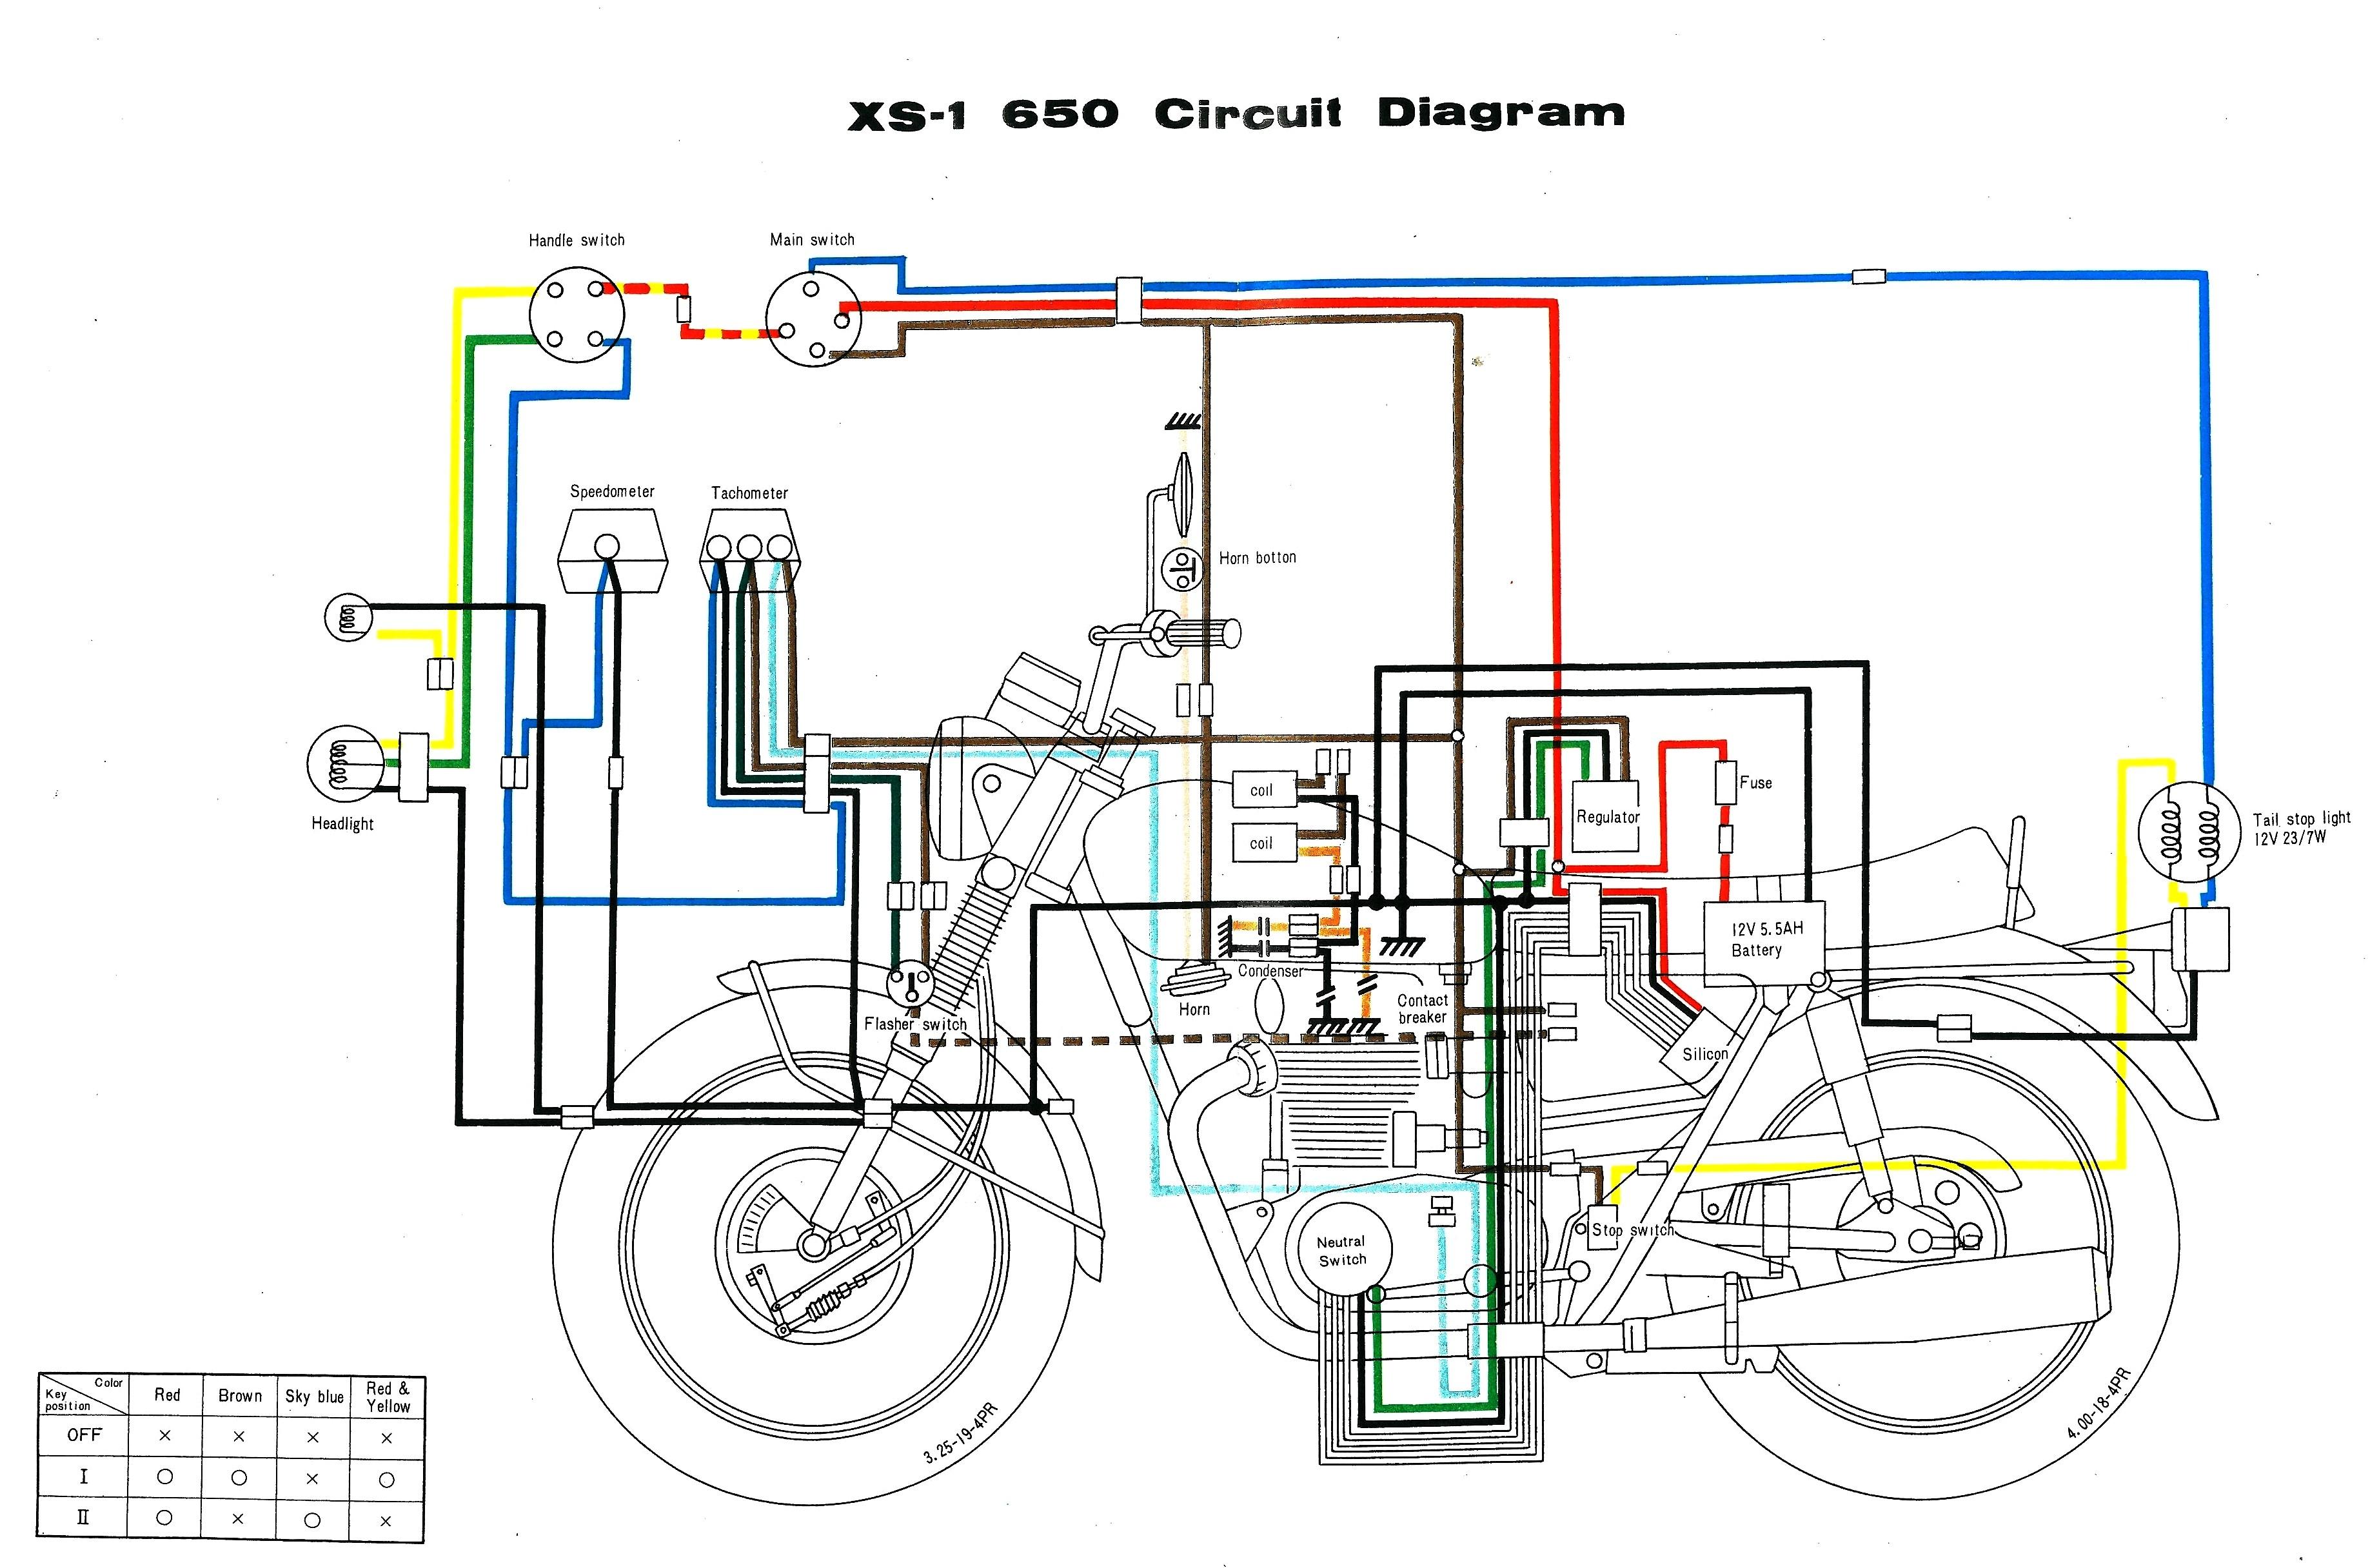 Honda 70 Engine Diagram Iwak Kutok Saturn Sl1 Engine Diagram Wiring Info • Of Honda 70 Engine Diagram